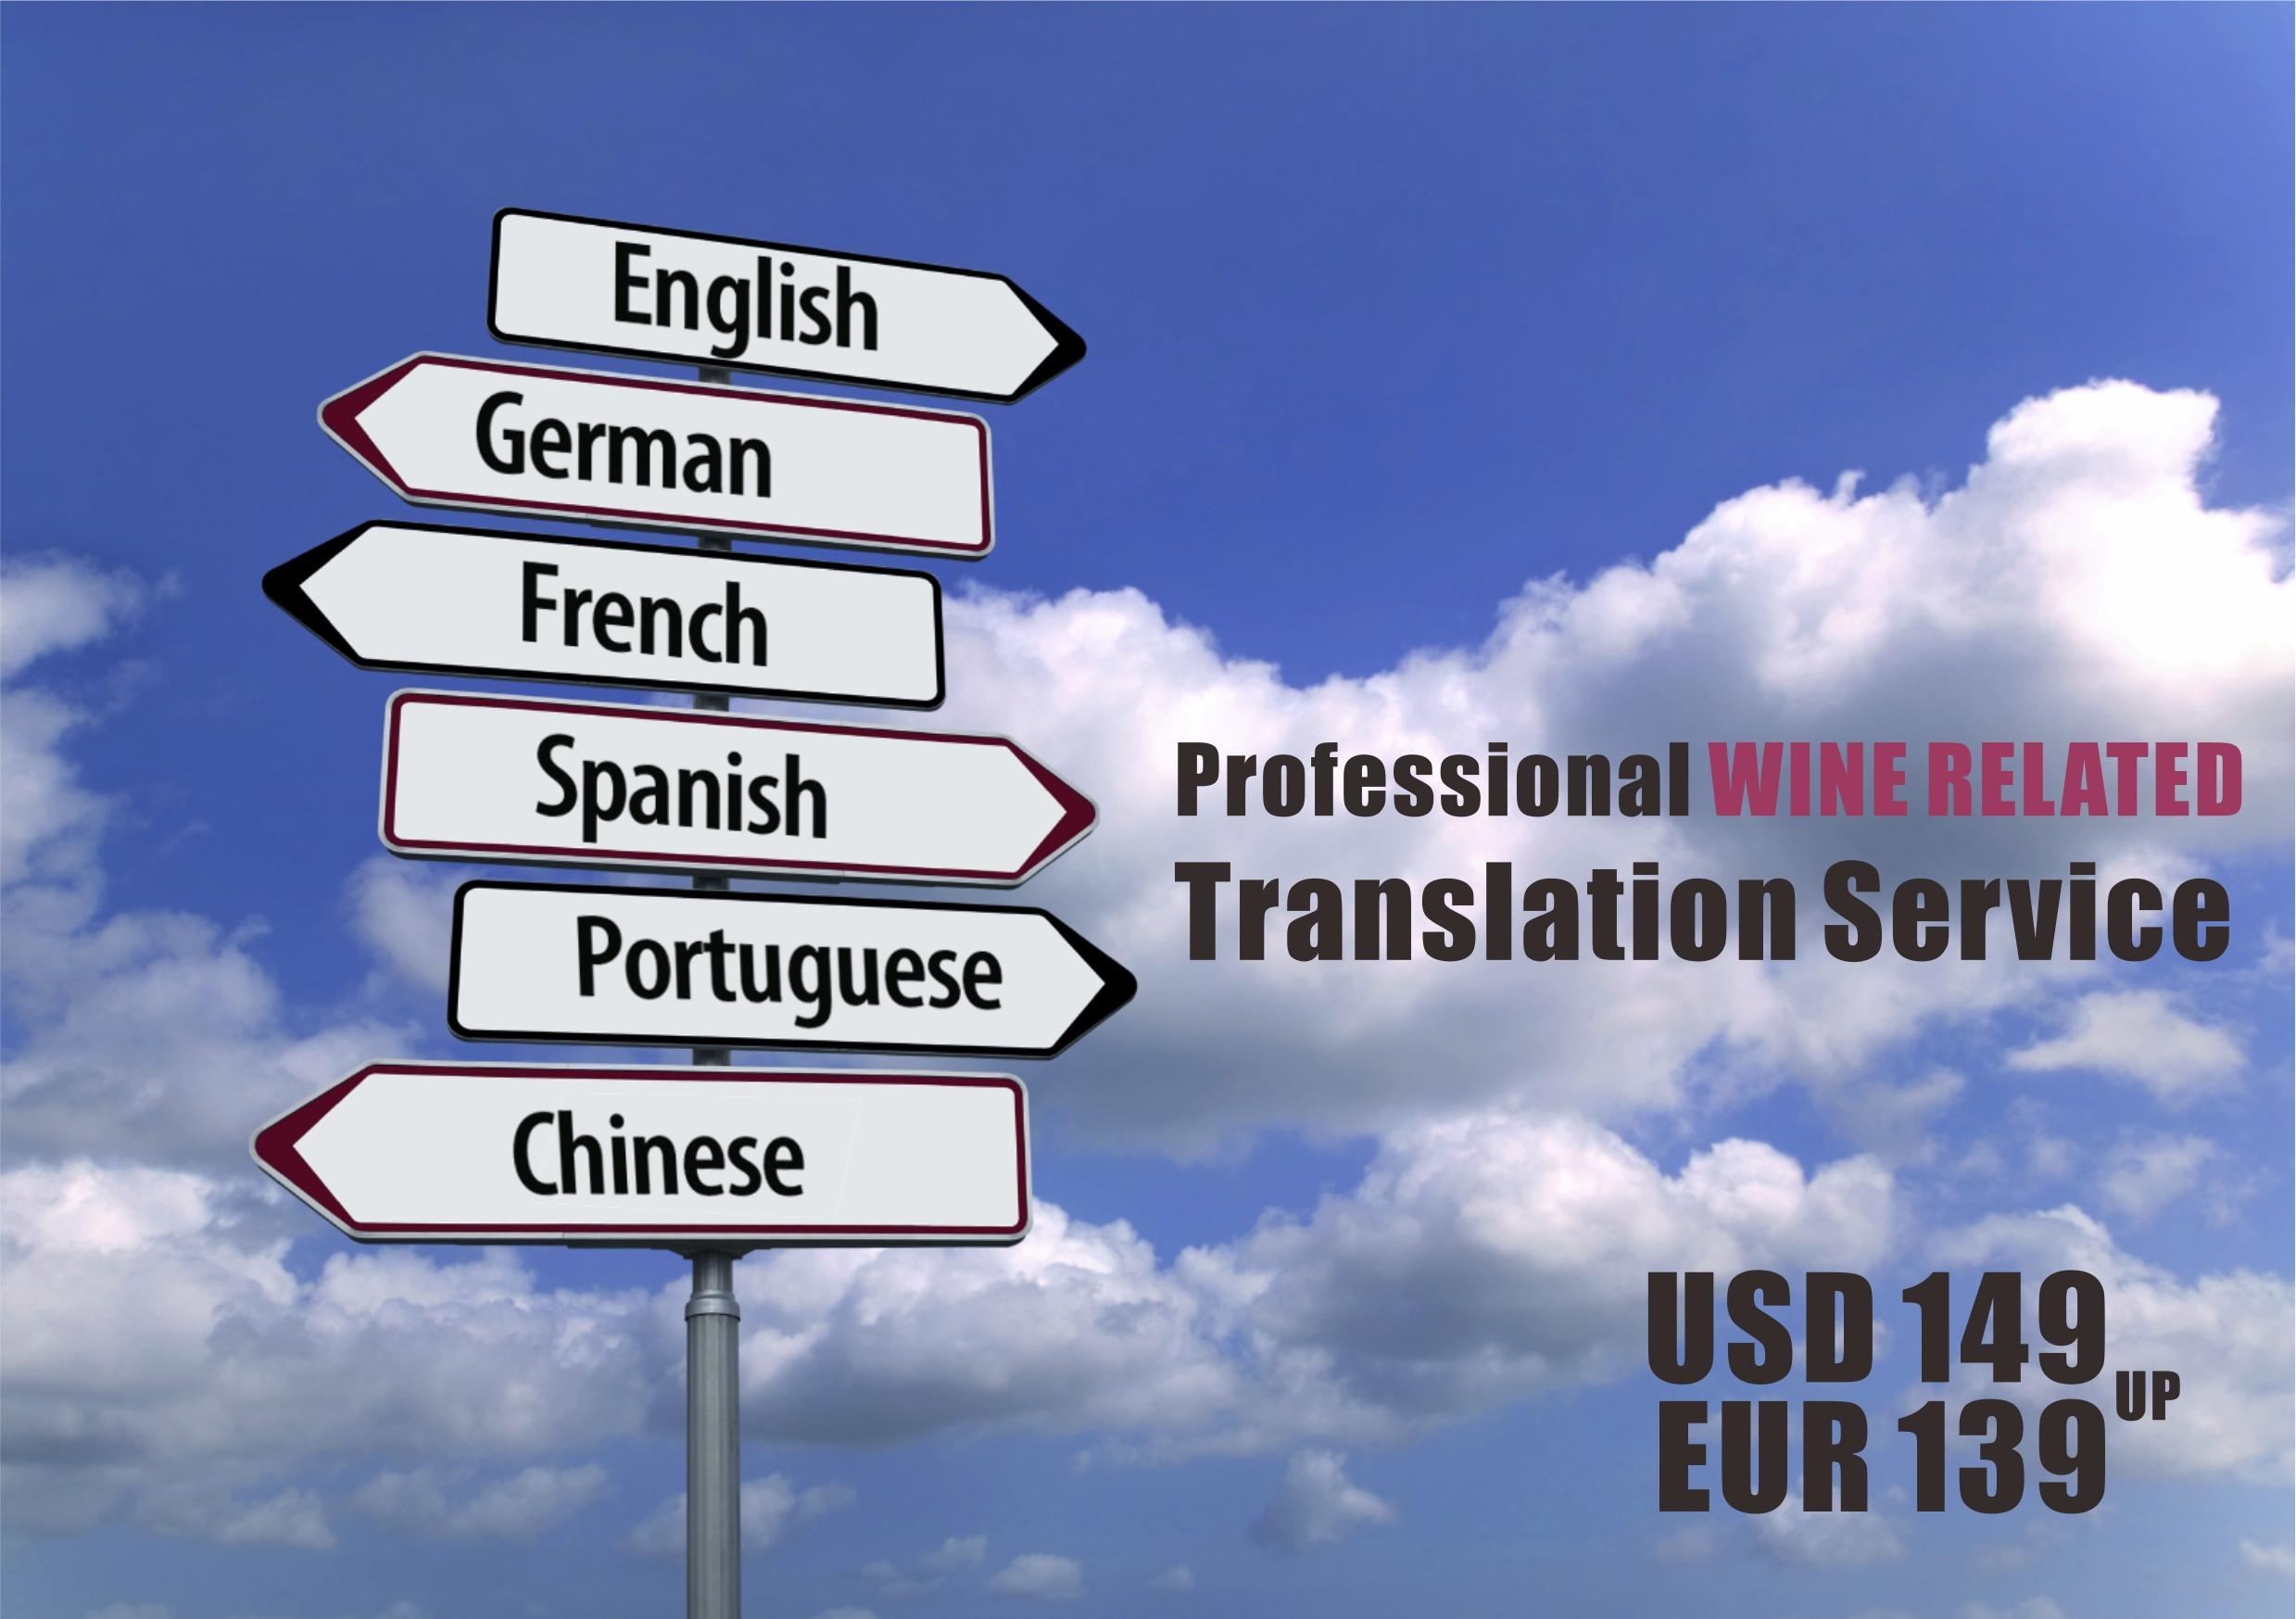 Wine-Related Translation Service